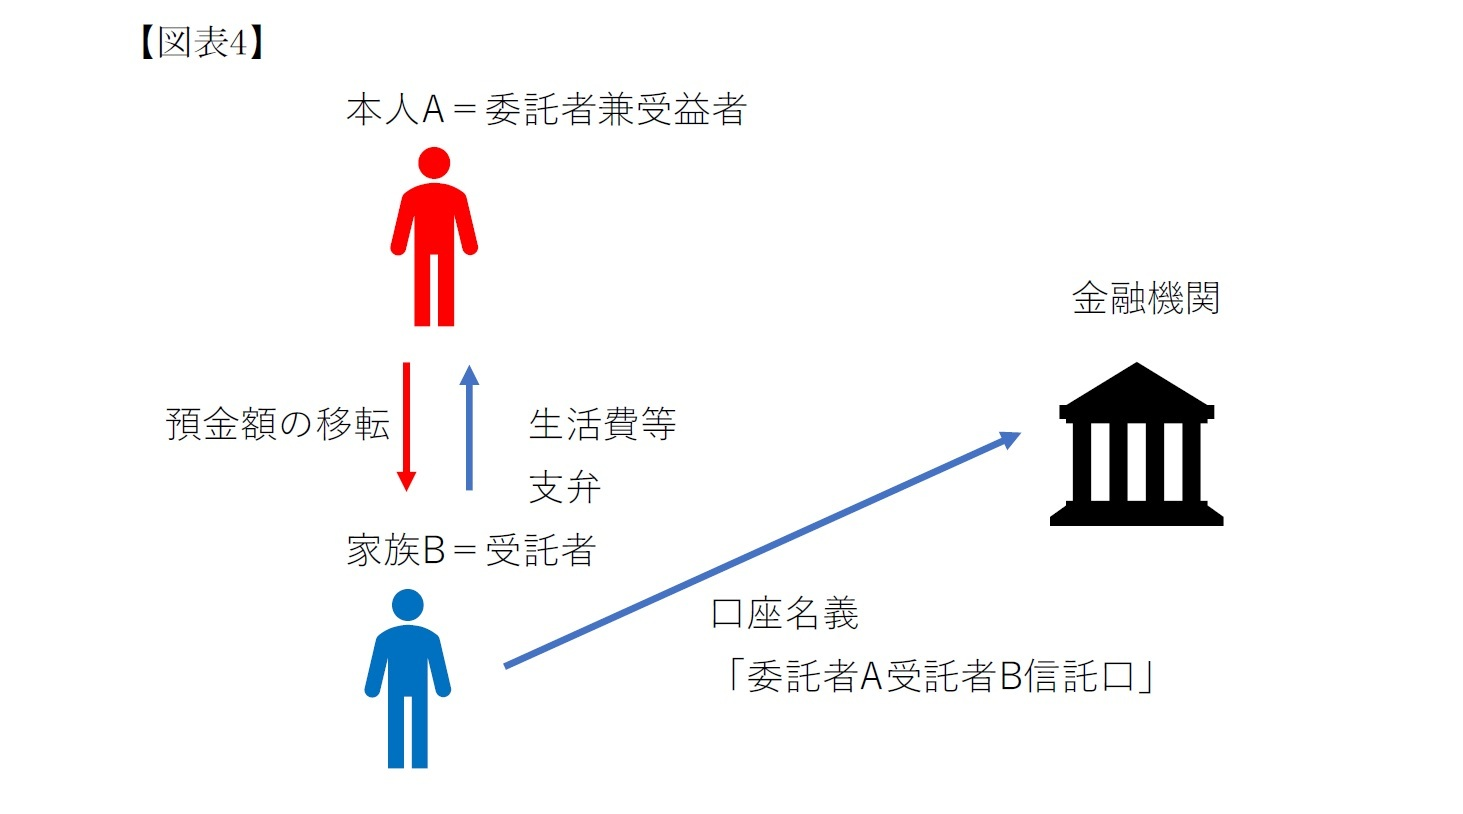 【図表4】信託法第3条